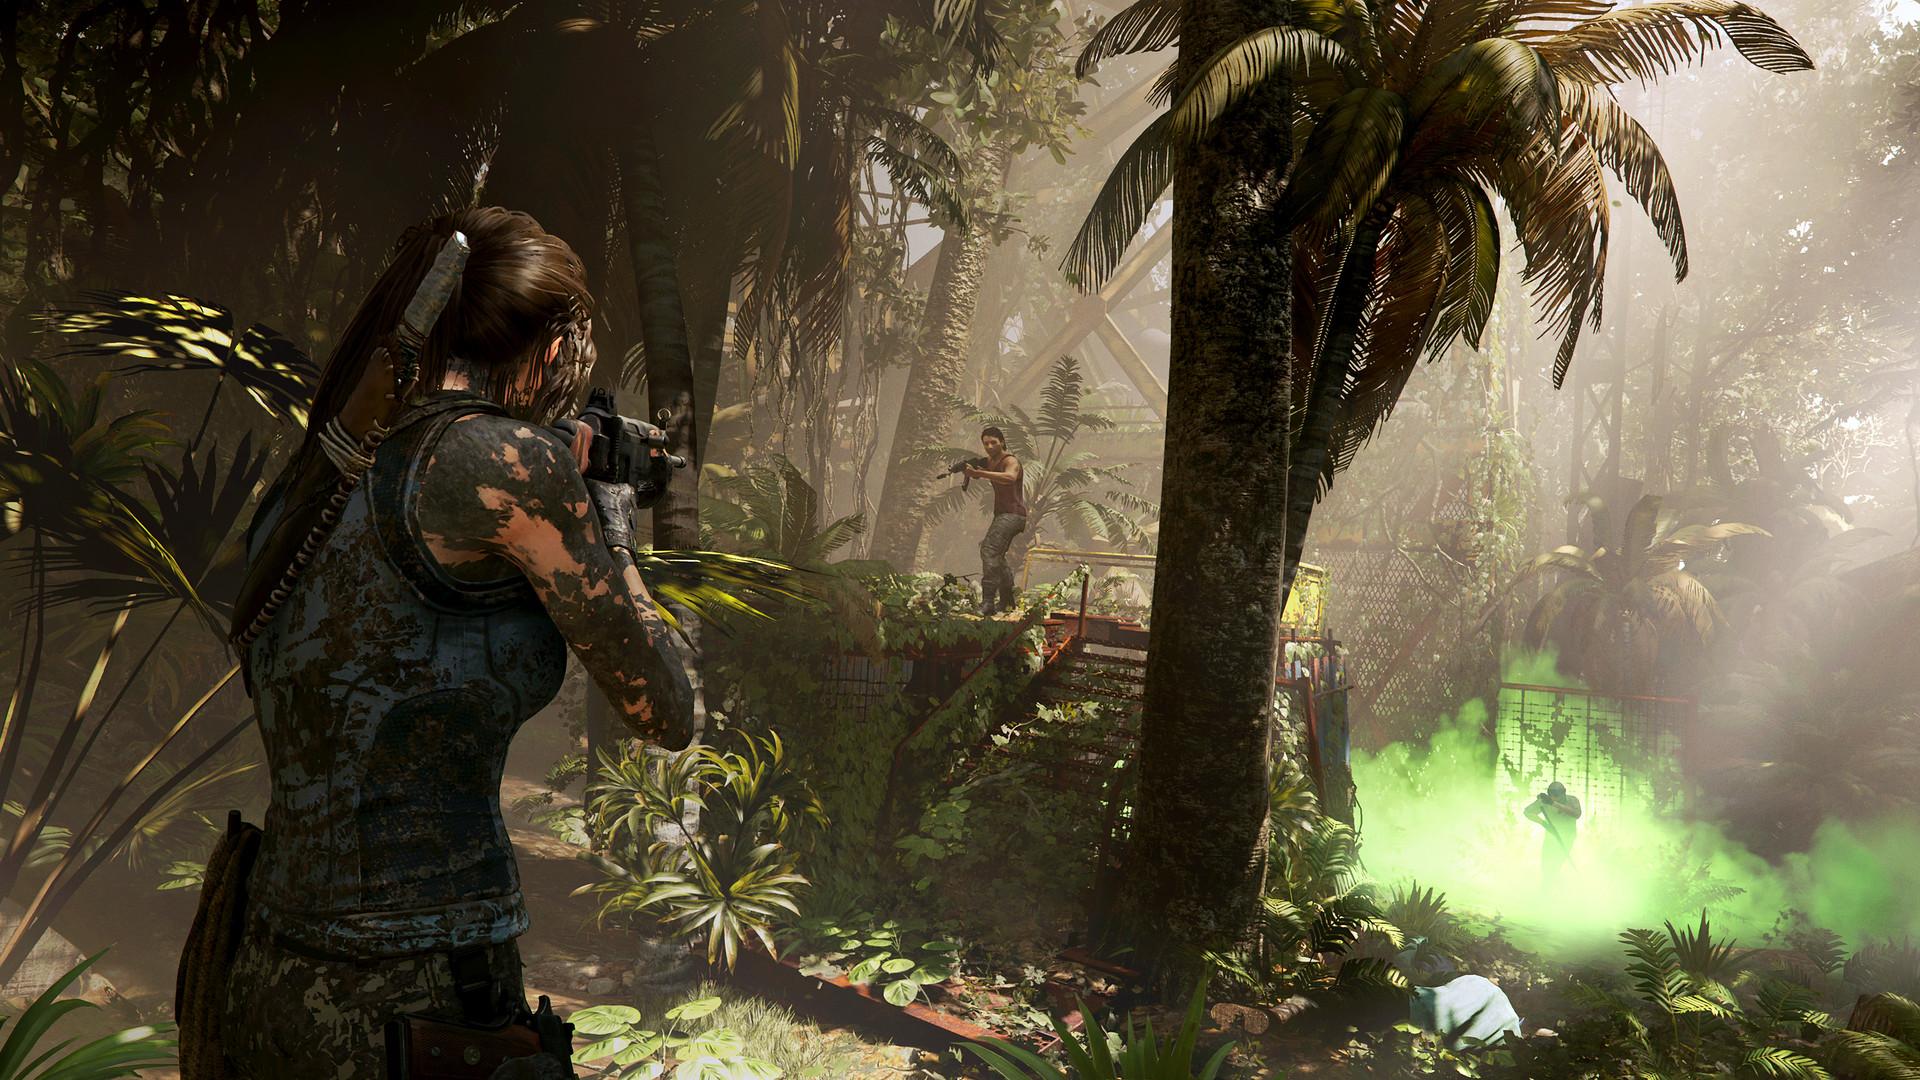 Shadow of the Tomb Raider будет максимально приближена к классическим играм о приключениях Лары Крофт